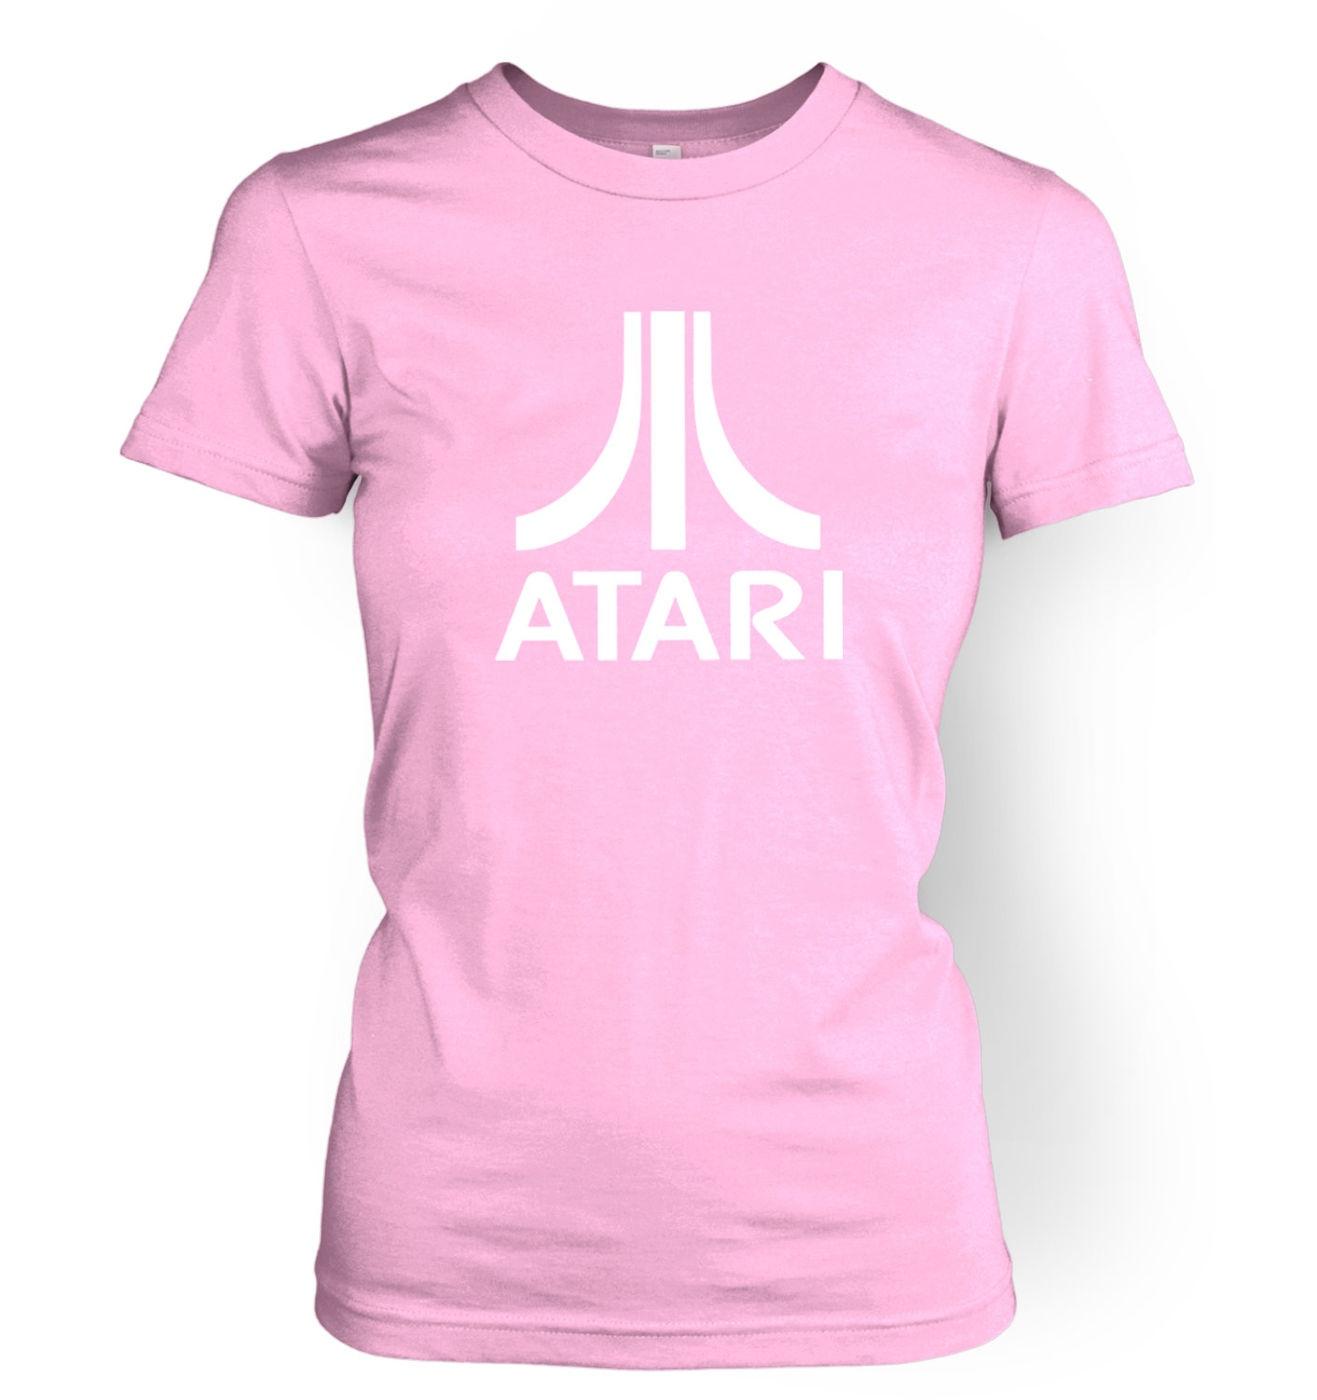 Atari Logo women's fitted t-shirt